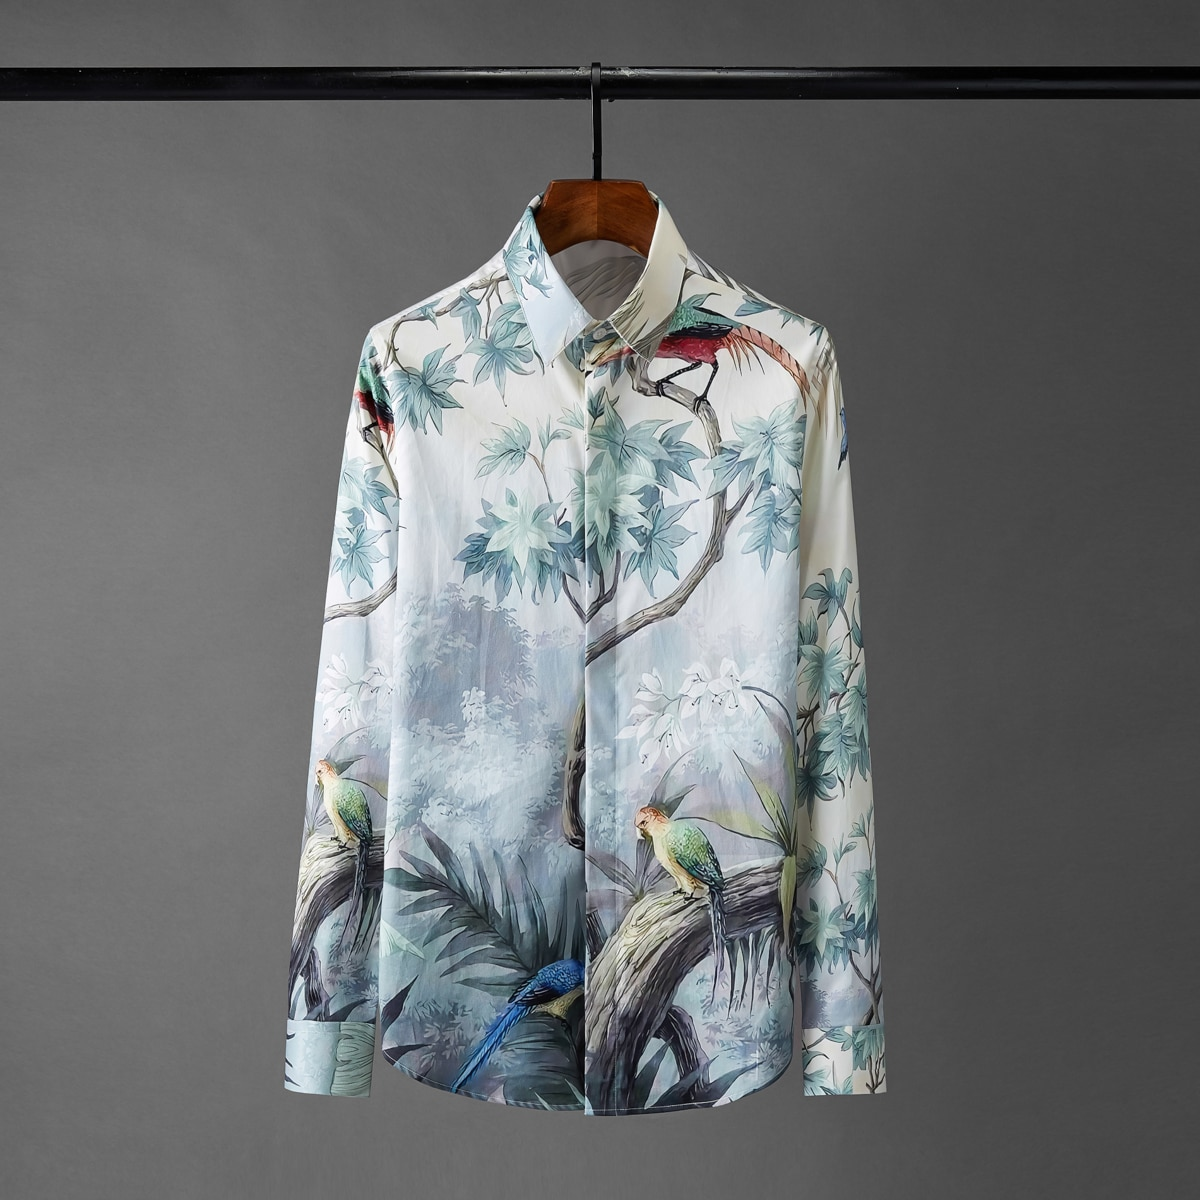 Minglu قمصان رجالي الفاخرة الرقمية جميع ملابس منقوشة بكم طويل حفلة رجالي قمصان حجم كبير 4xl قمصان الموضة سليم رجل عادية